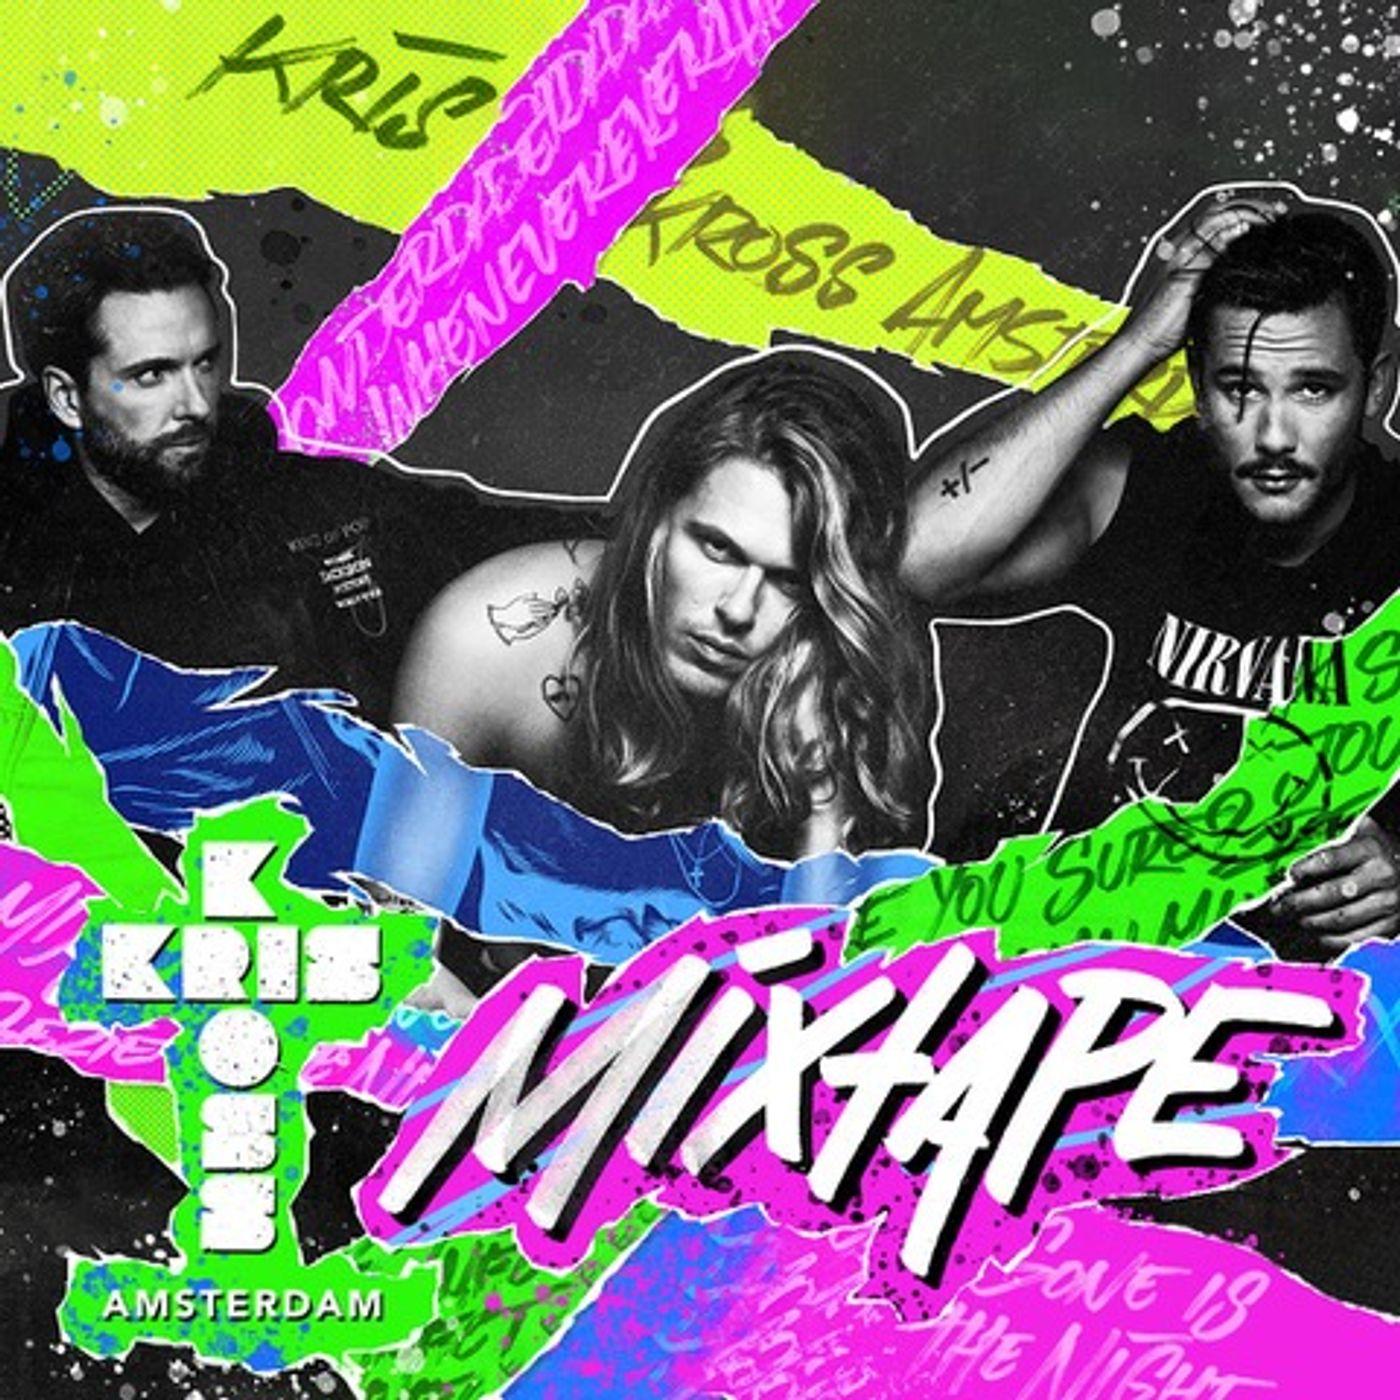 Kris Kross Amsterdam | Kris Kross Mixtape #118